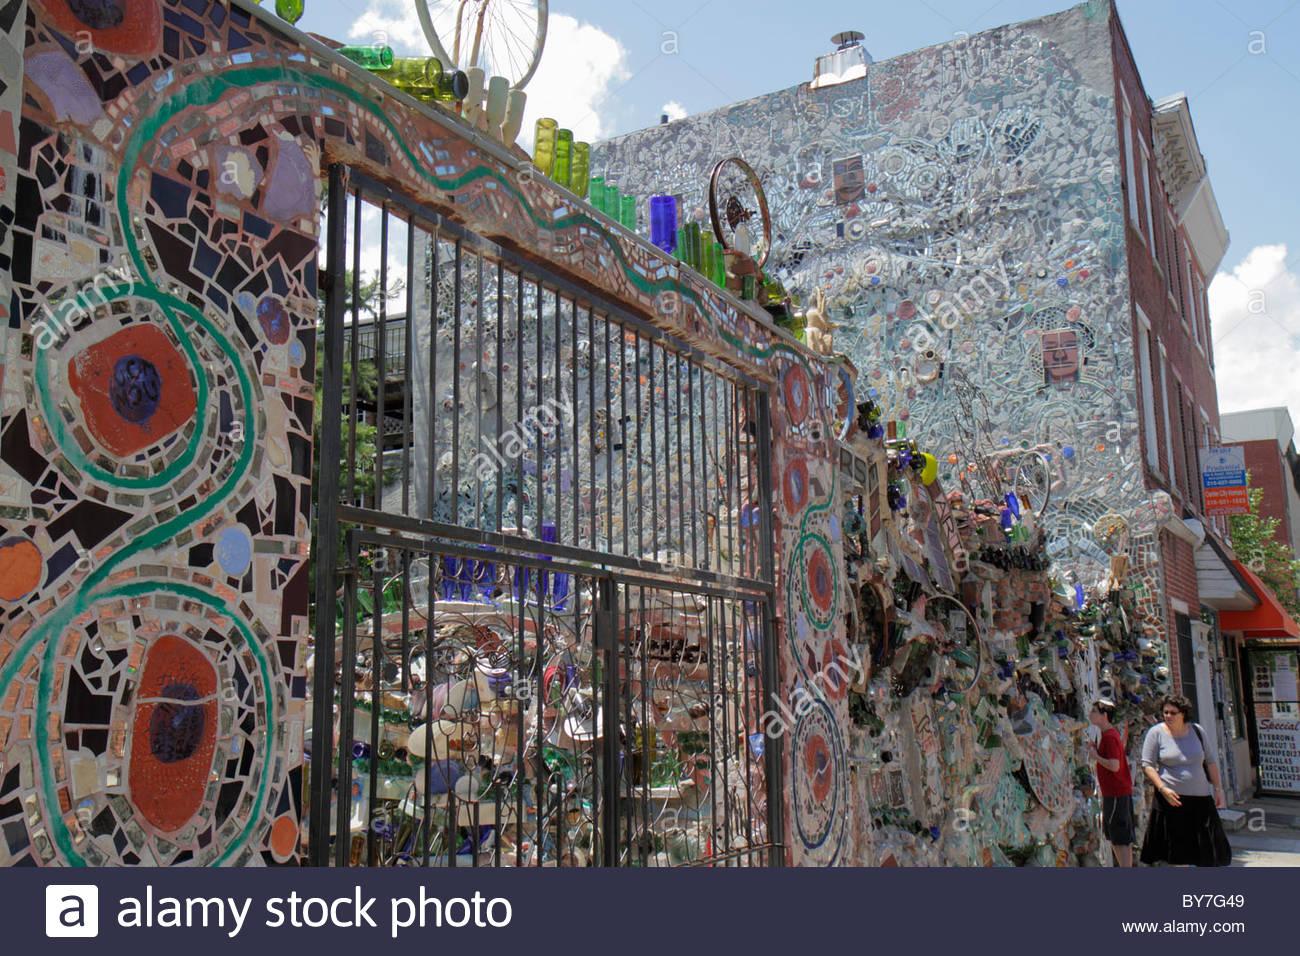 fence art installation. philadelphia pennsylvania south philly street magic gardens mosaic isaiah zagar art artist installation fence stock